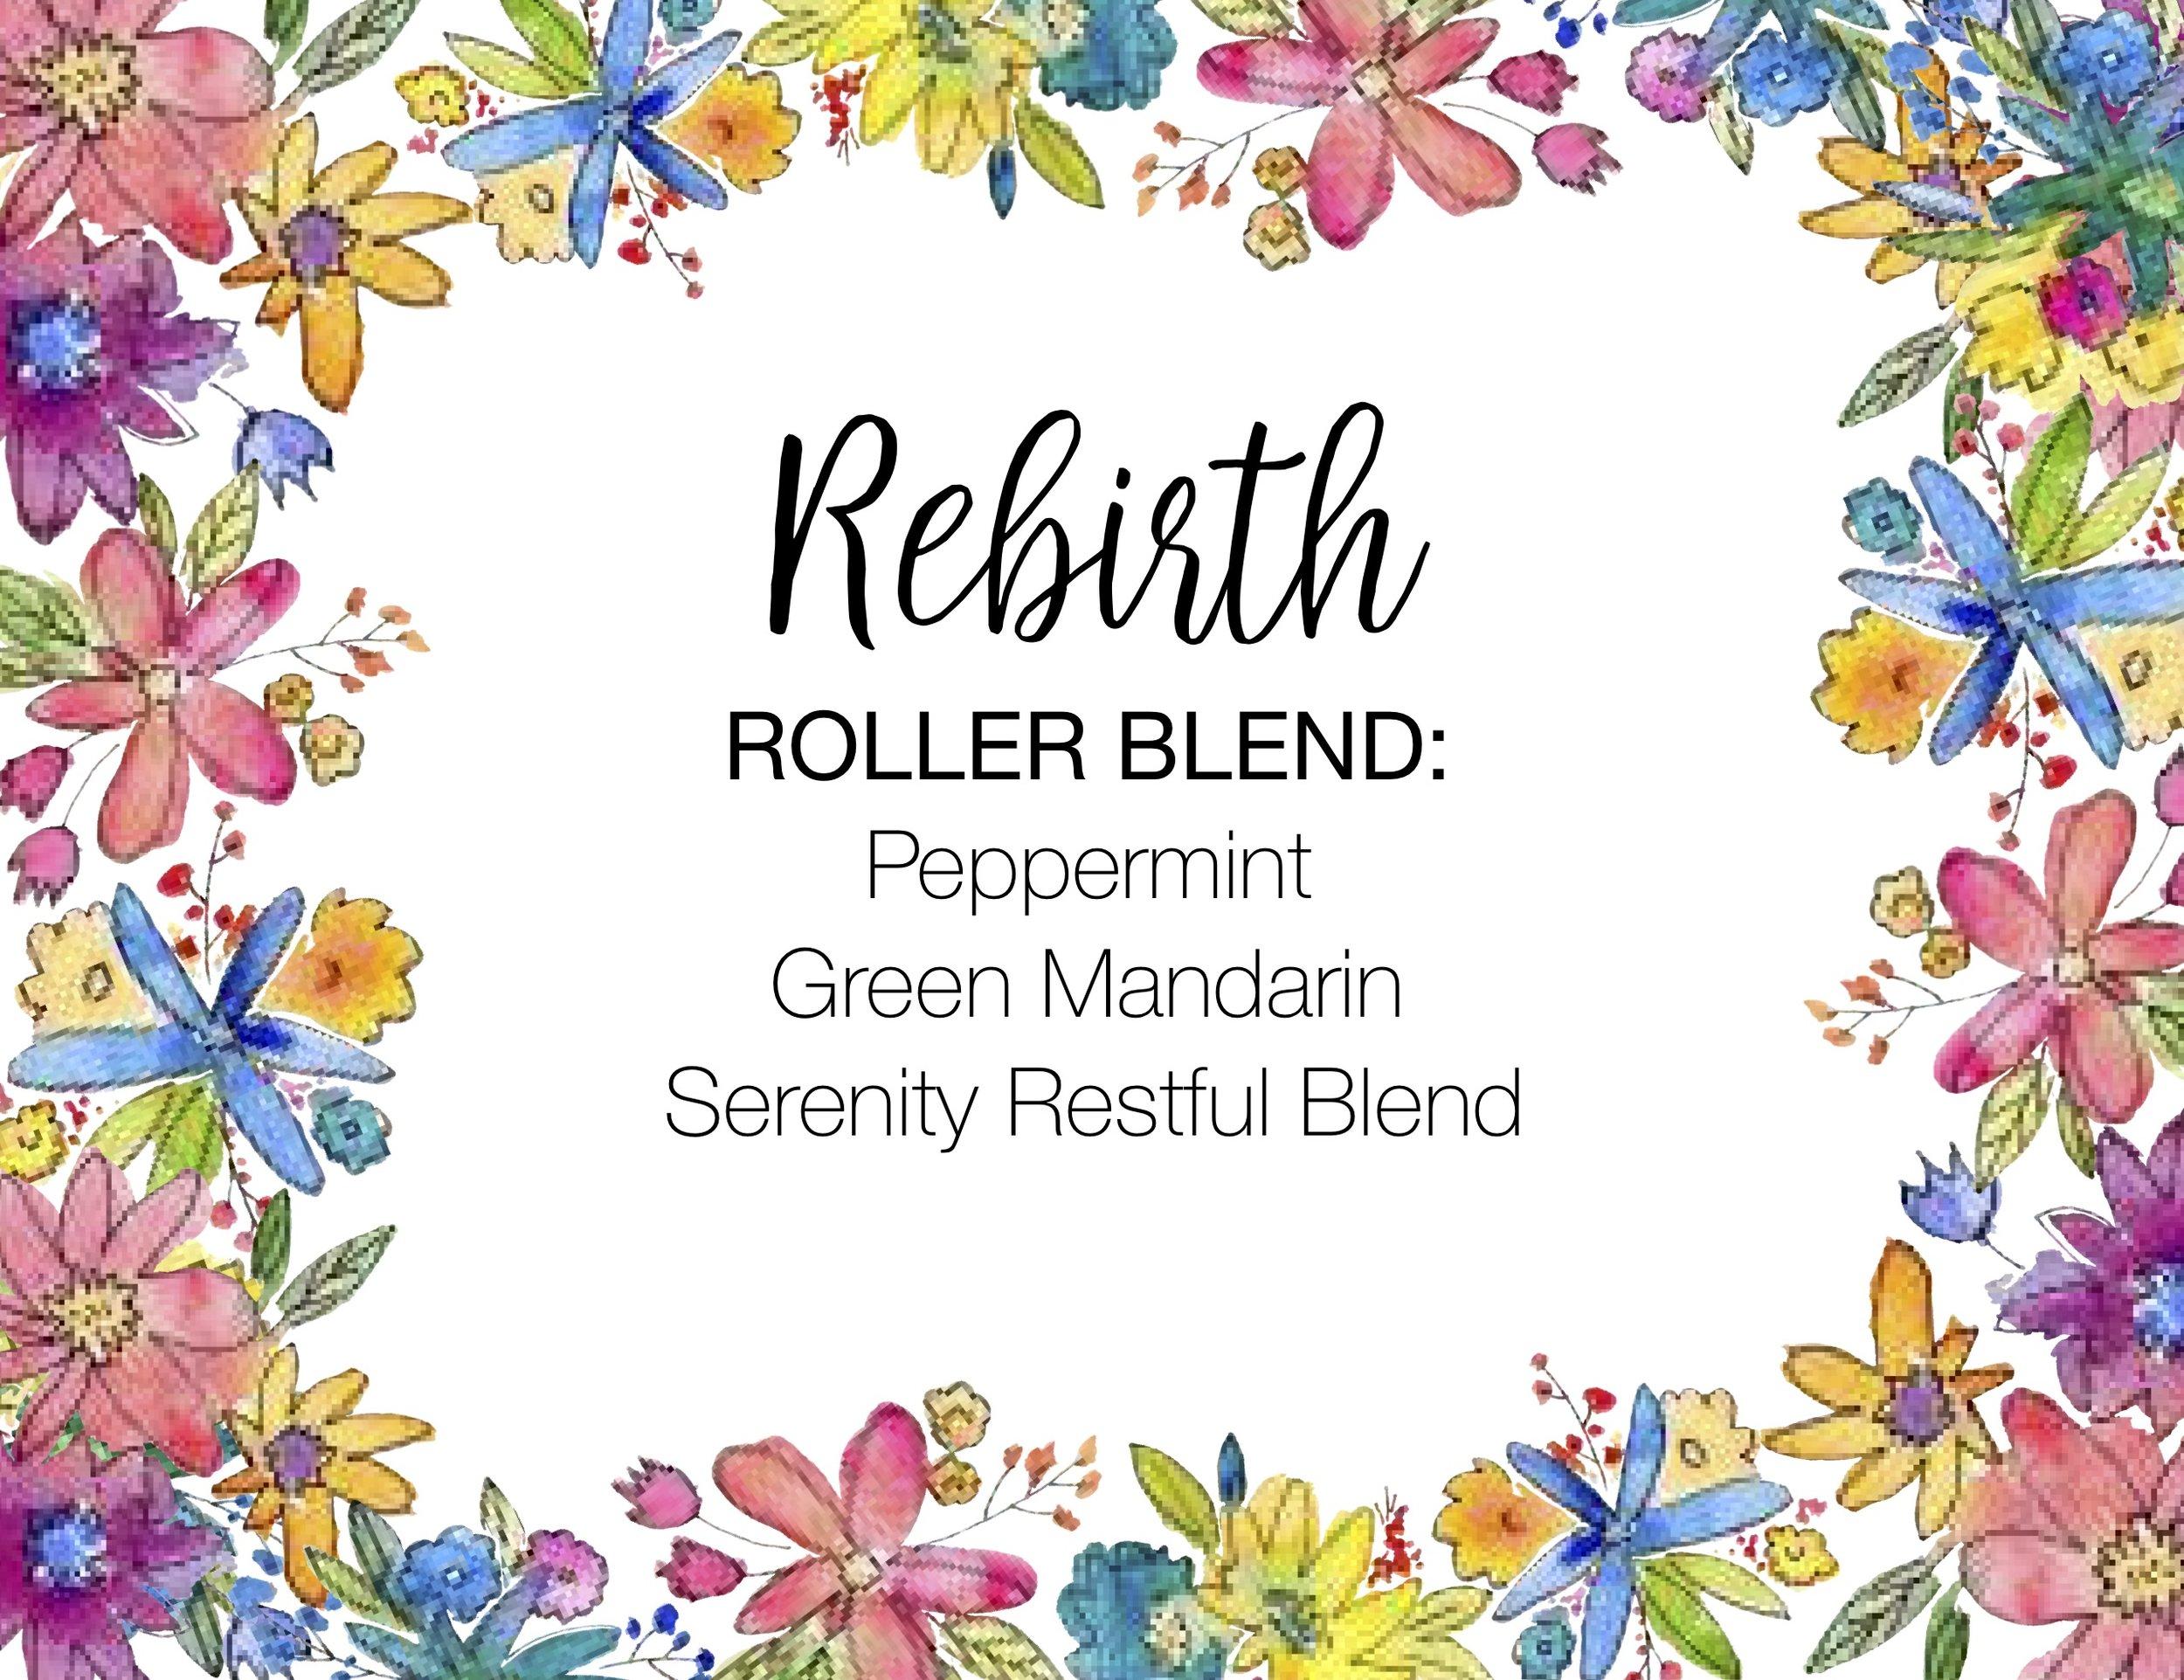 Rebirth Rollerbotle Blend LABEL JPEG.jpg